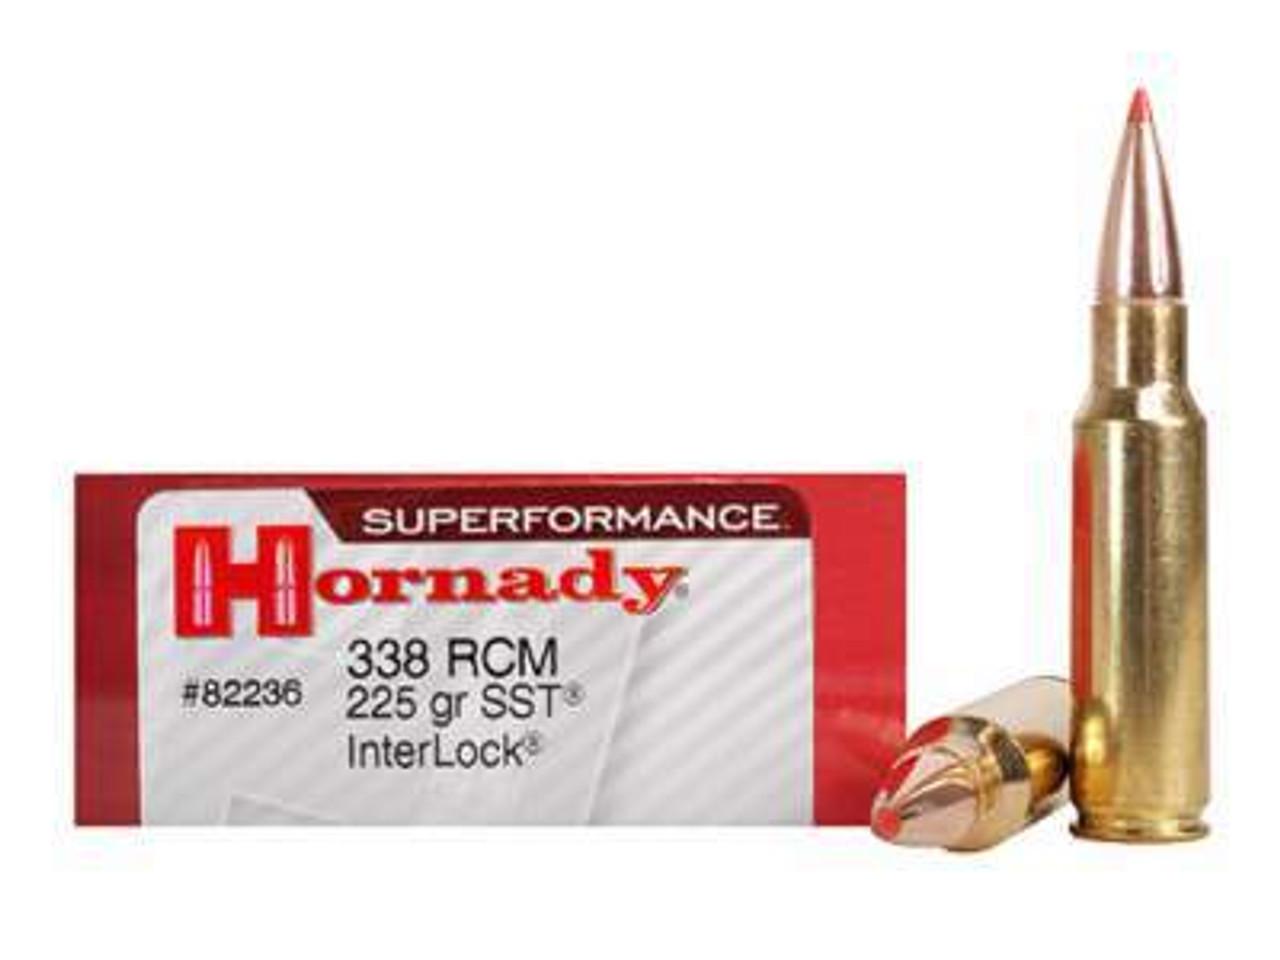 338 RCM Ammo